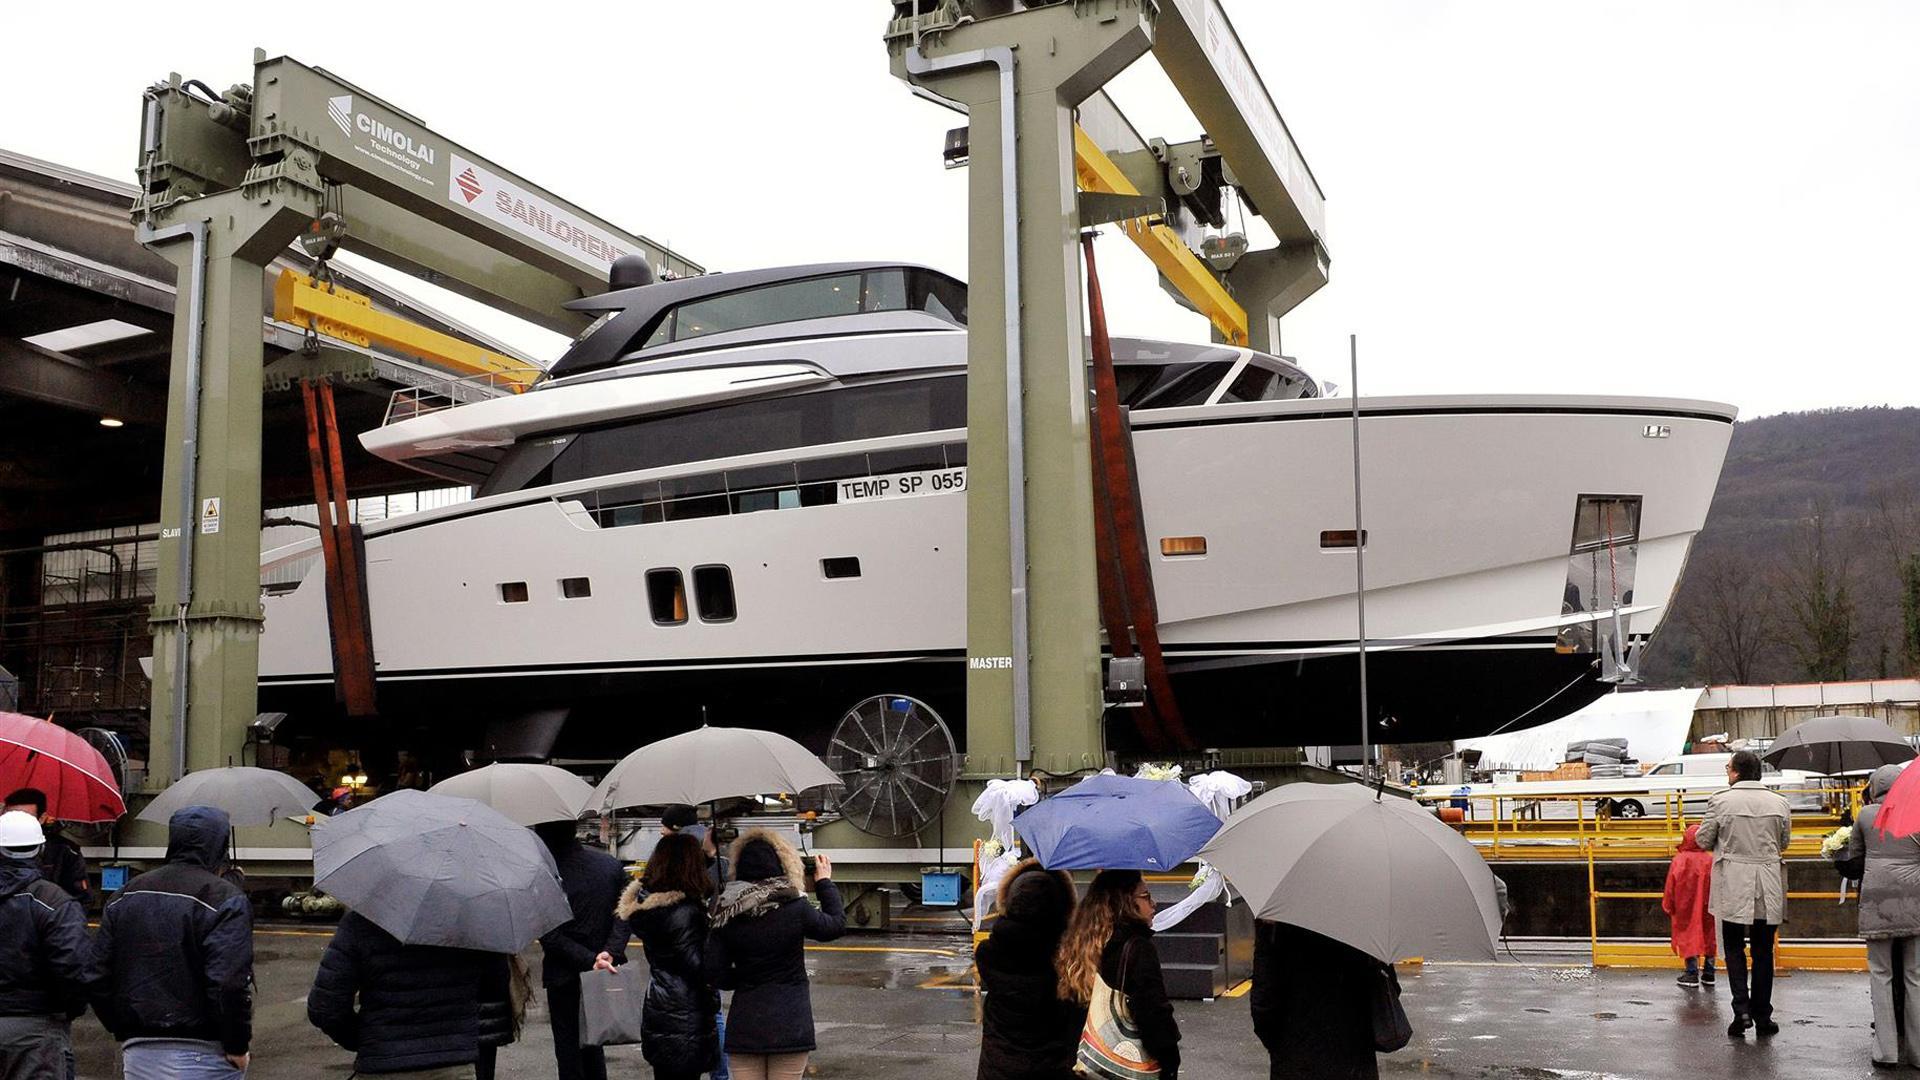 sx88 hull 3 motoryacht sanlorenzo 27m 2018 launch